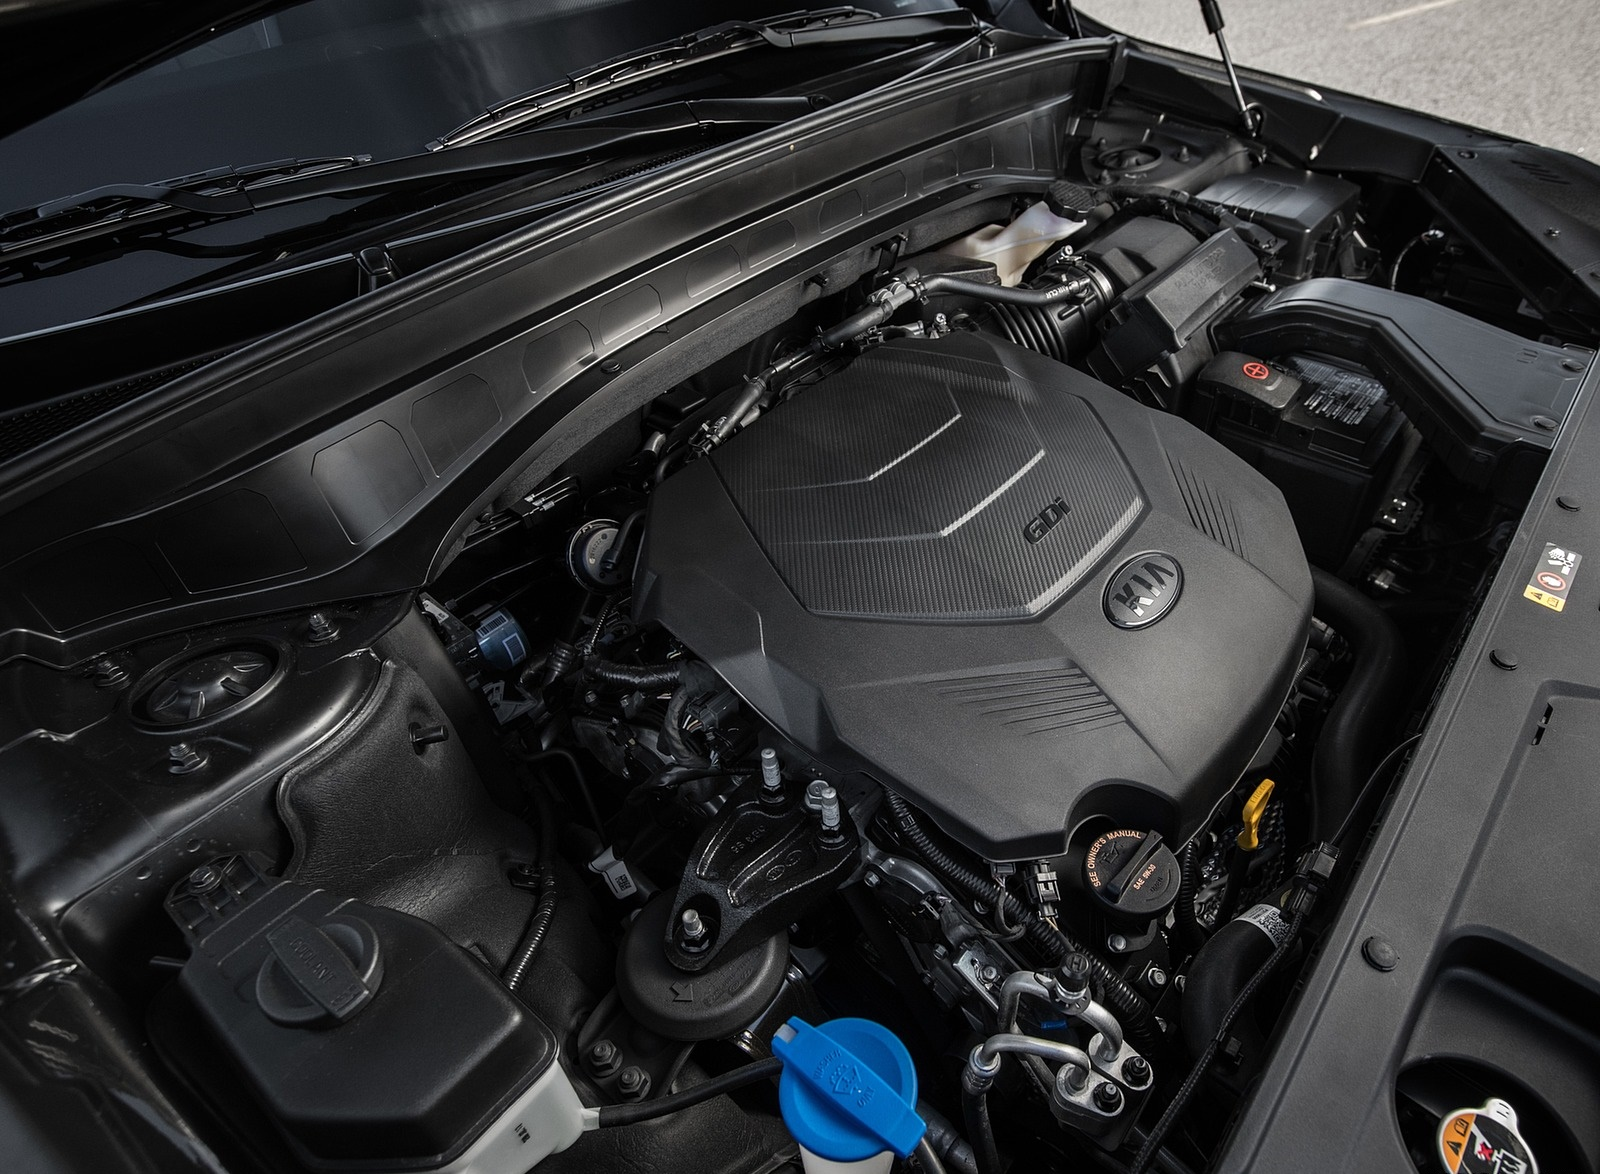 2020 Kia Telluride Engine Wallpaper (9)